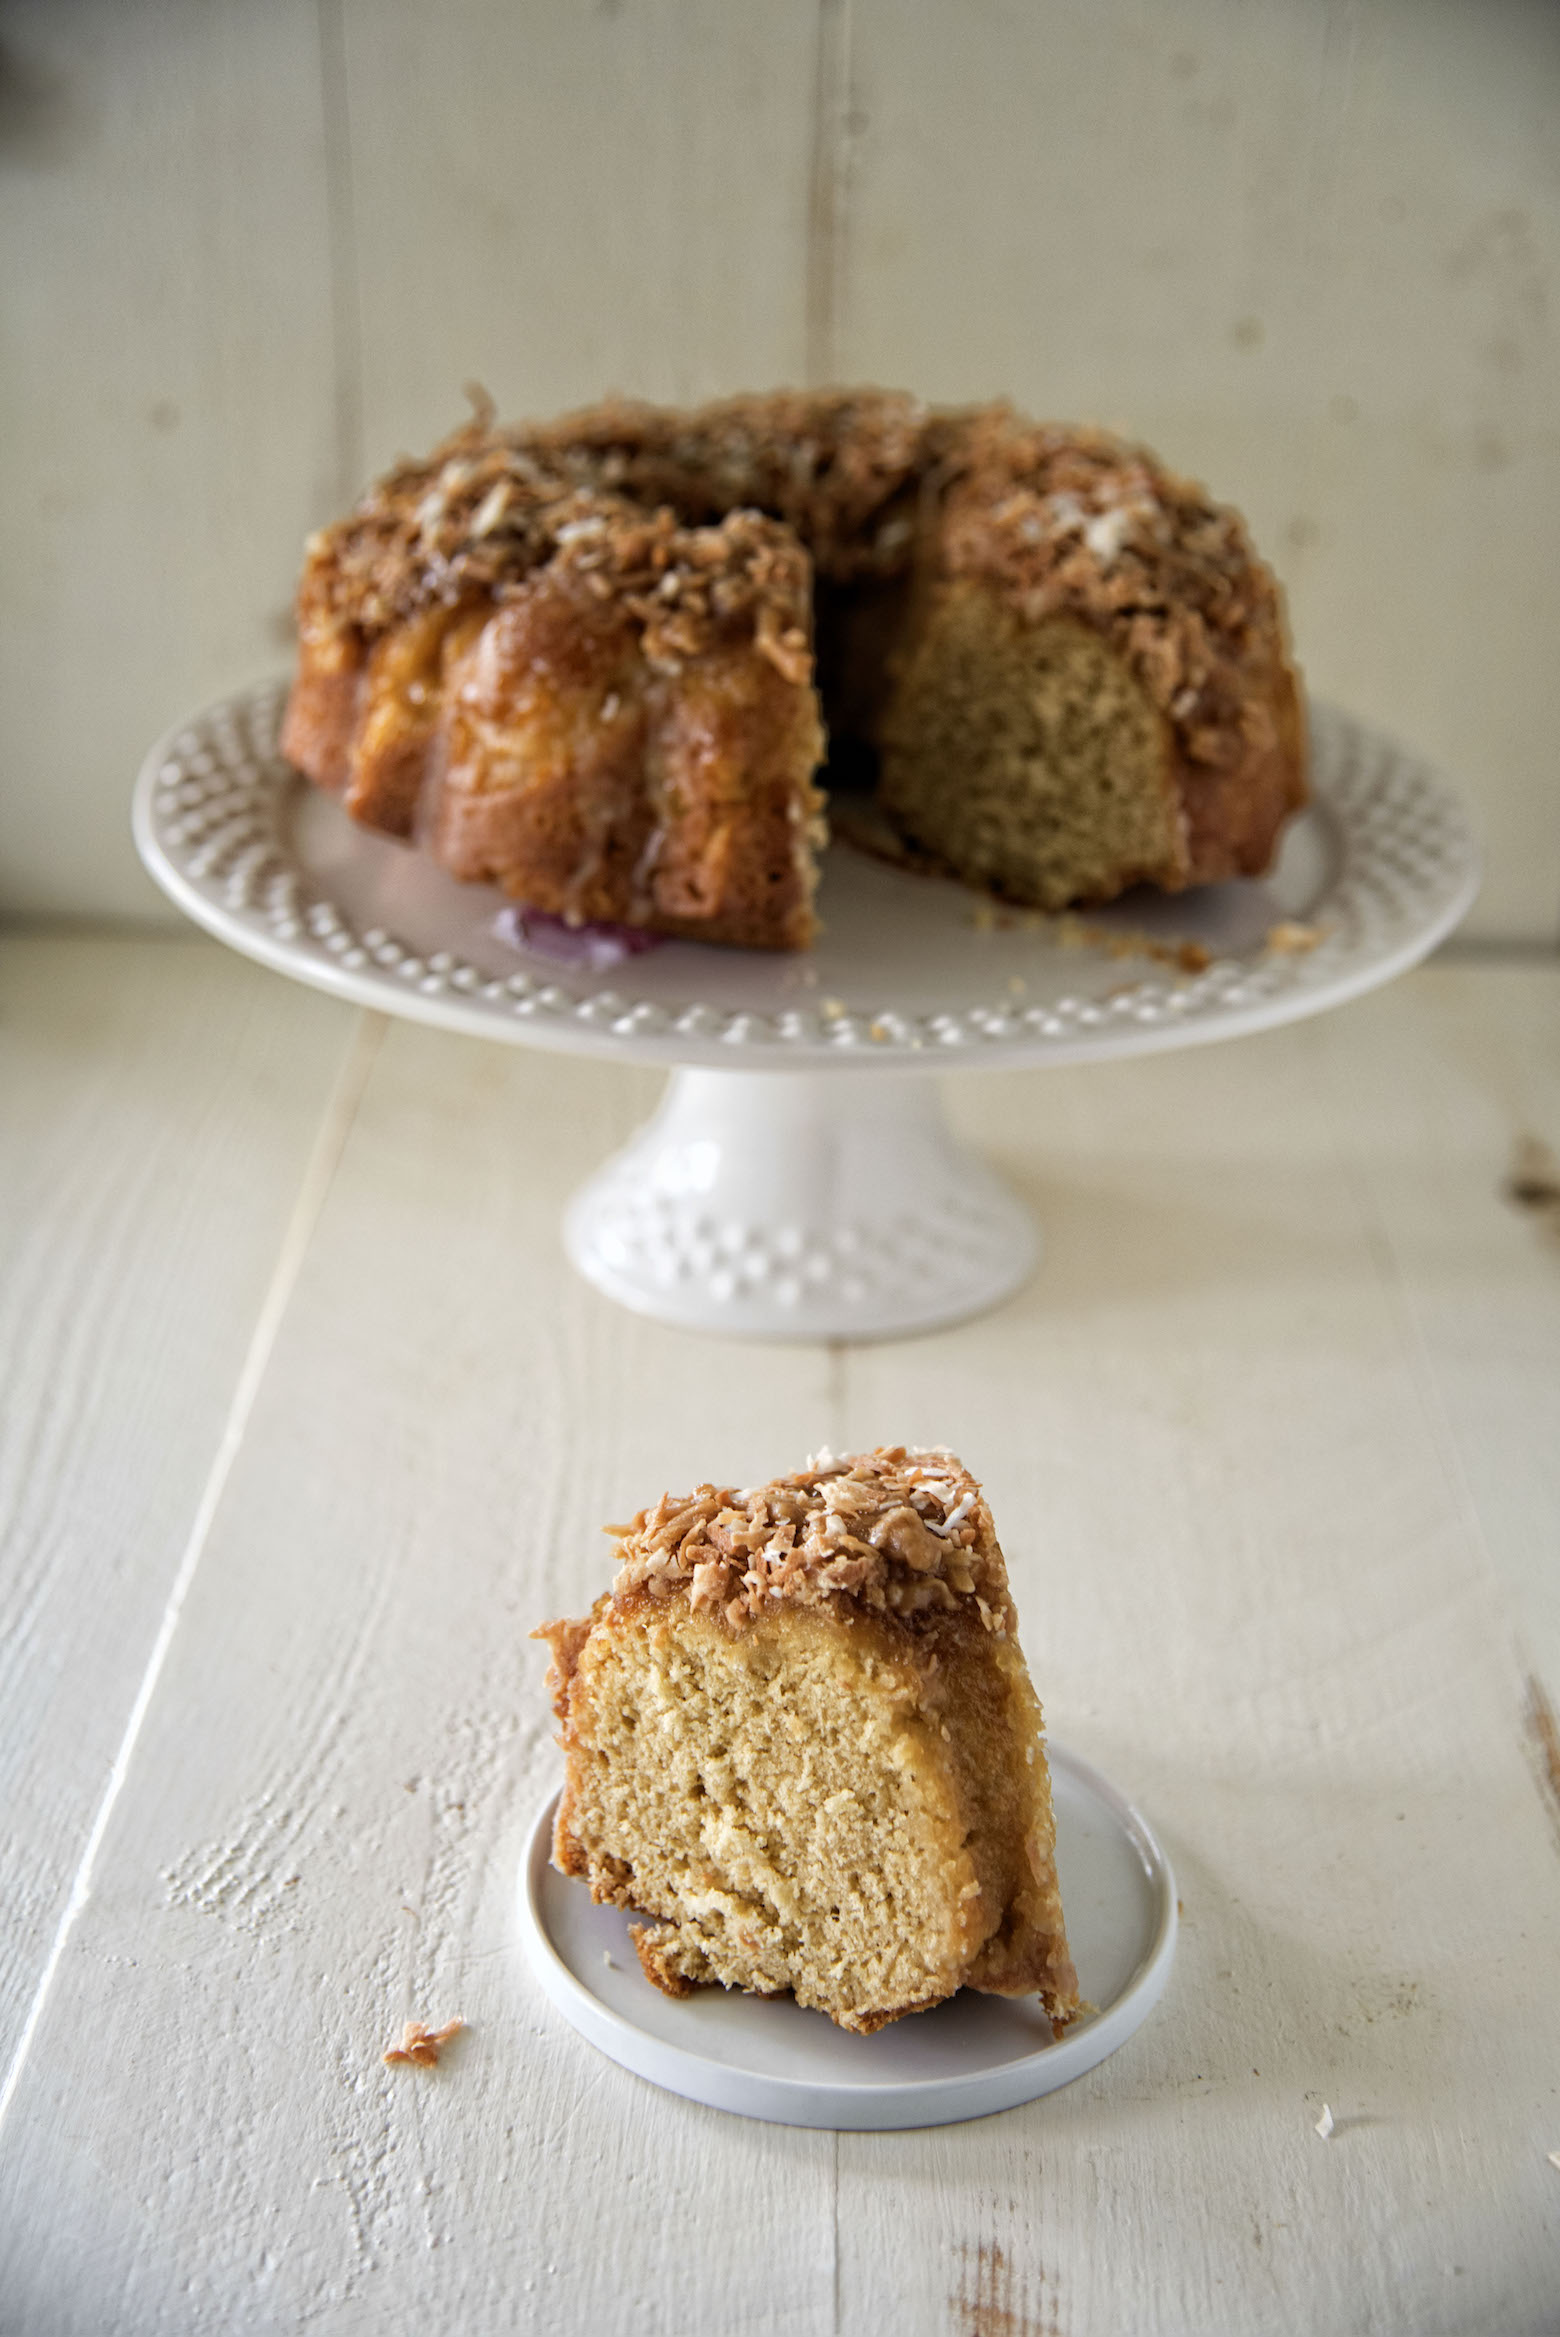 Caramel Rum Pina Colada Bundt Cake